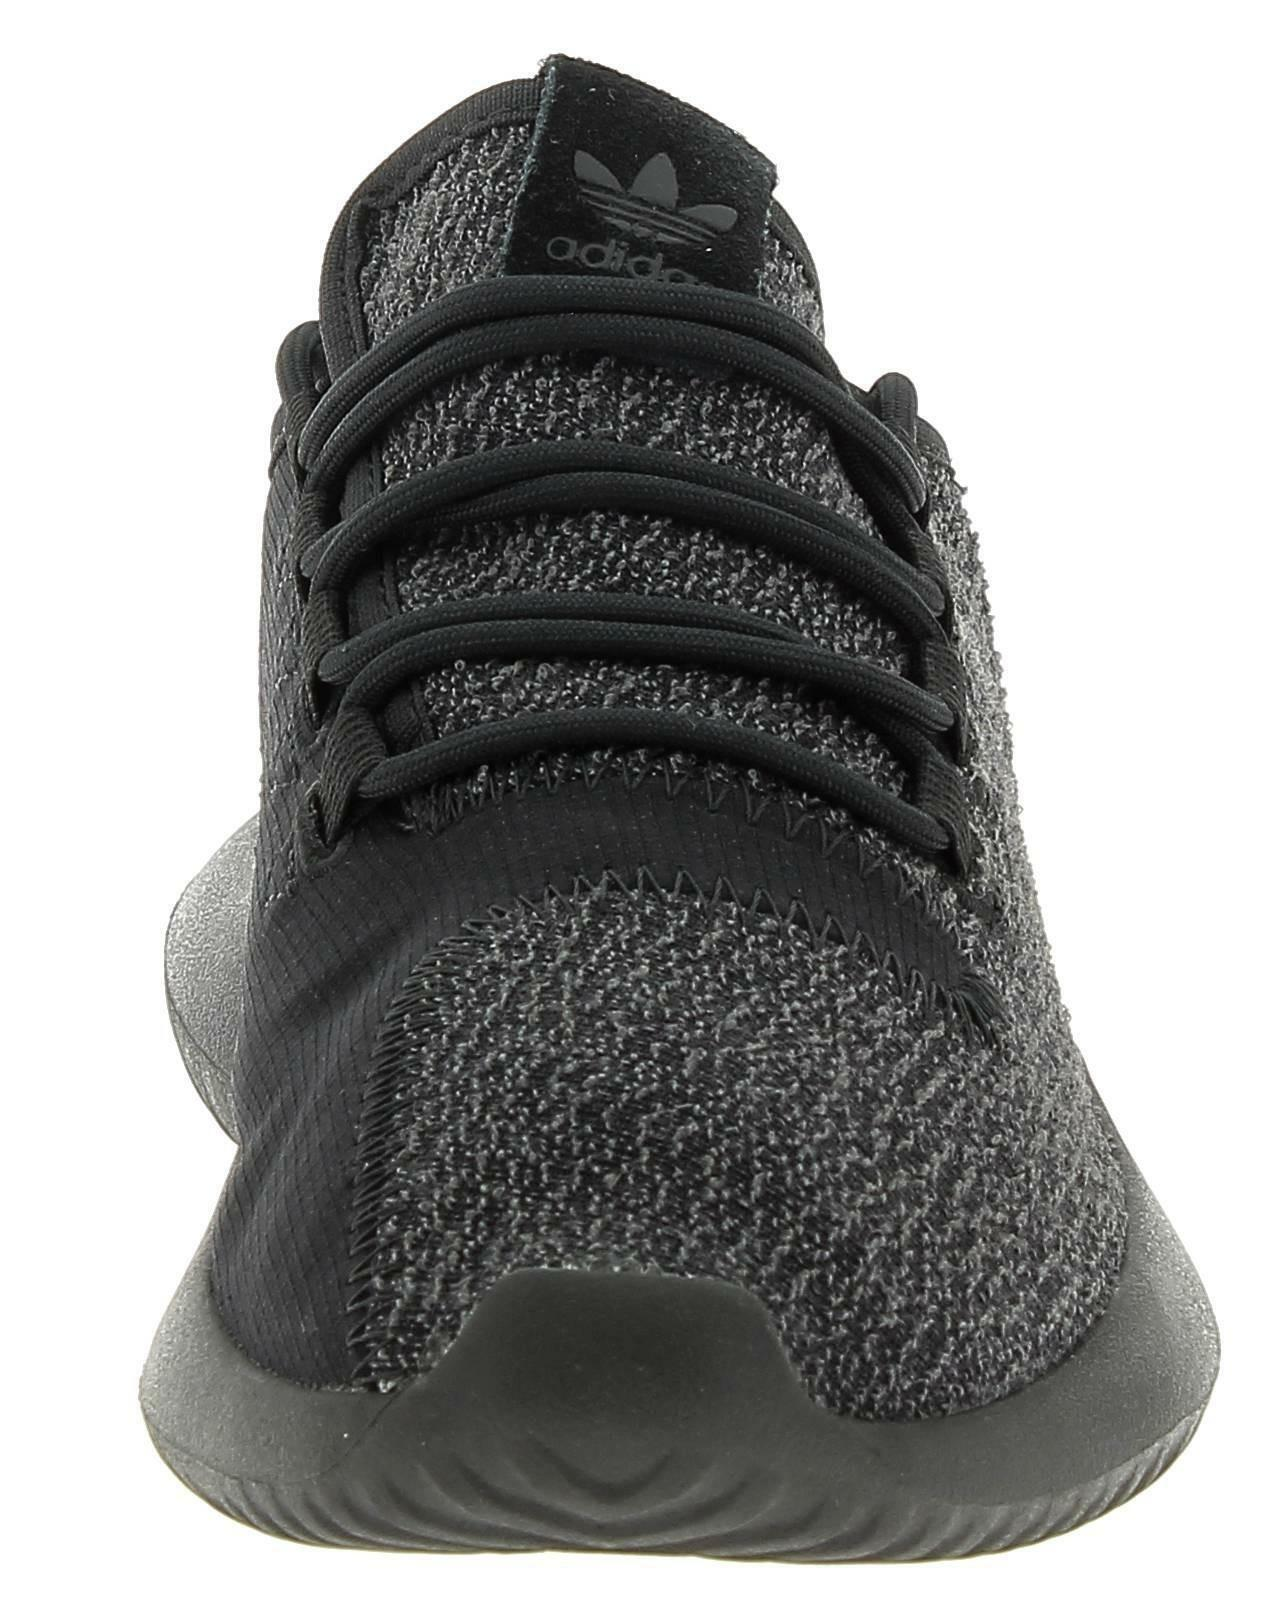 adidas adidas tubular shadow scarpe sportive nere